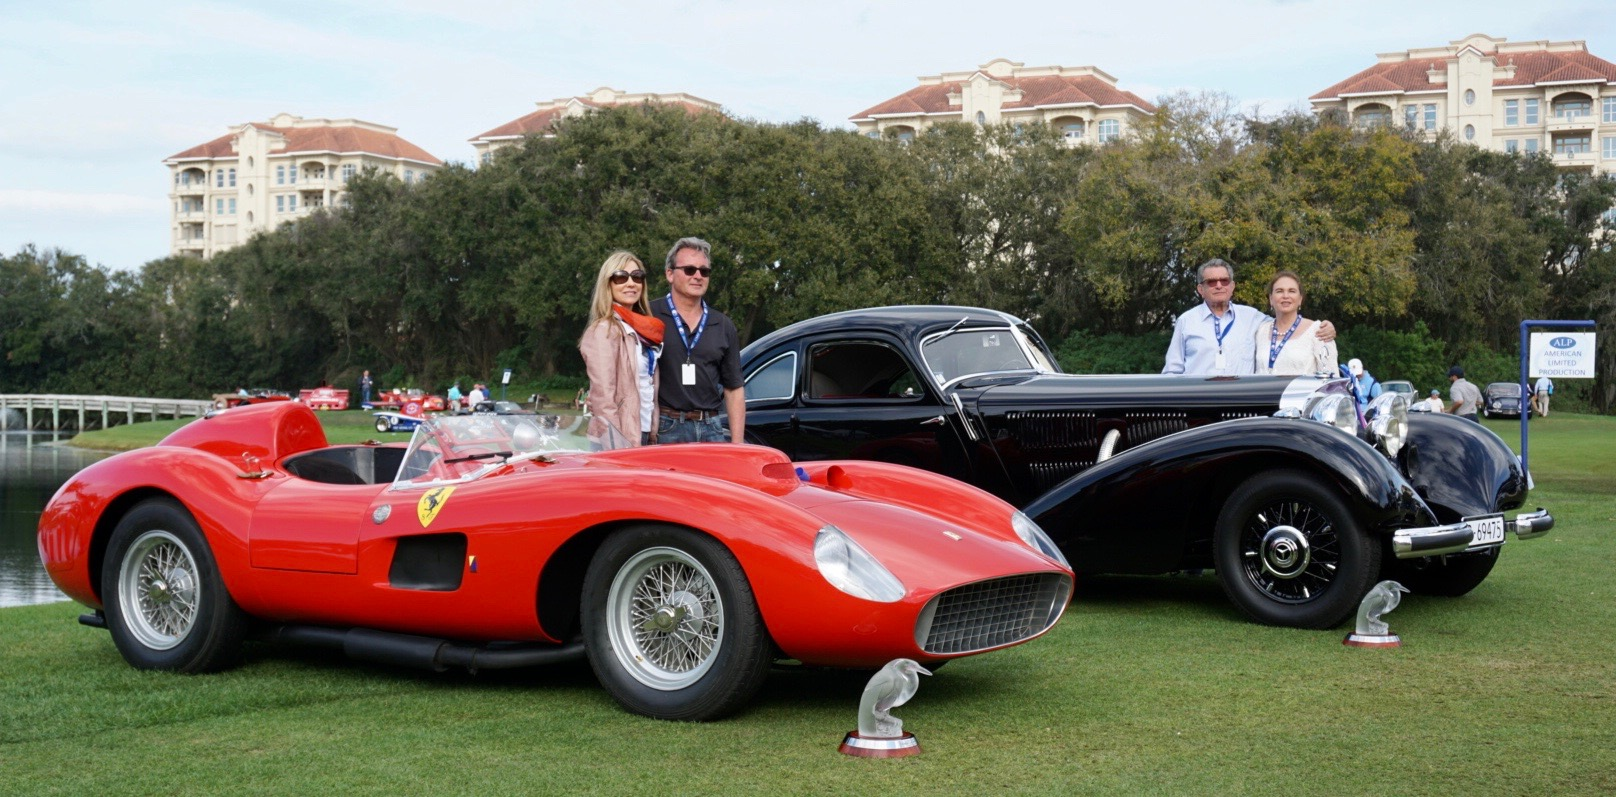 Amelia Island, Mercedes-Benz 540K fastback, star-driven Ferrari take top honors at Amelia Island, ClassicCars.com Journal